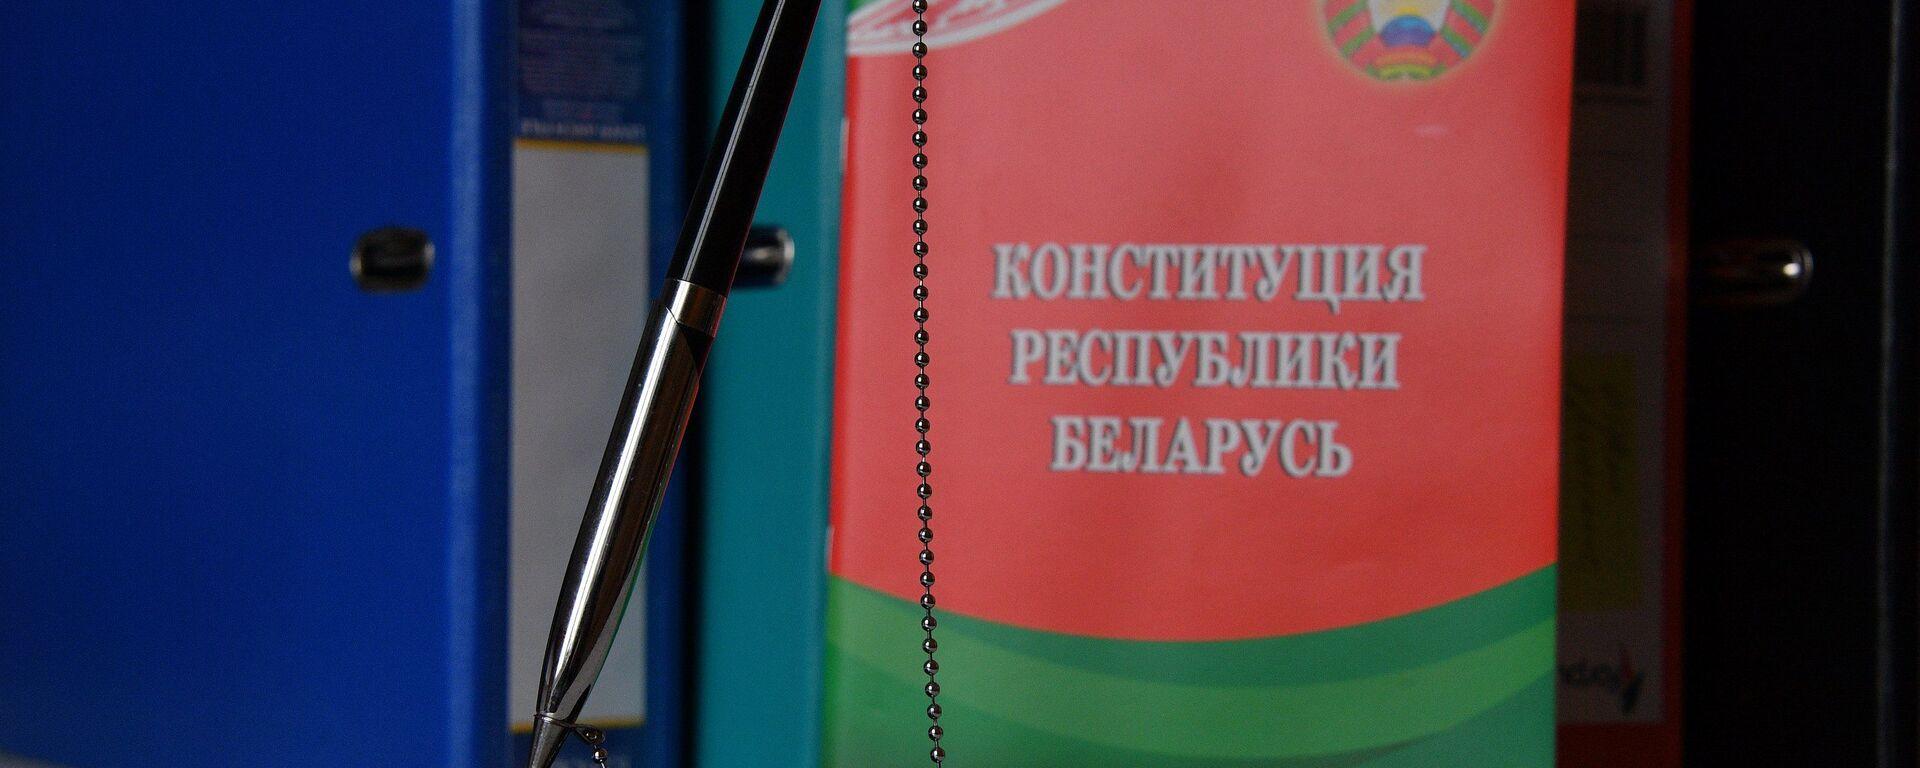 Конституция Республики Беларусь - Sputnik Беларусь, 1920, 16.03.2021